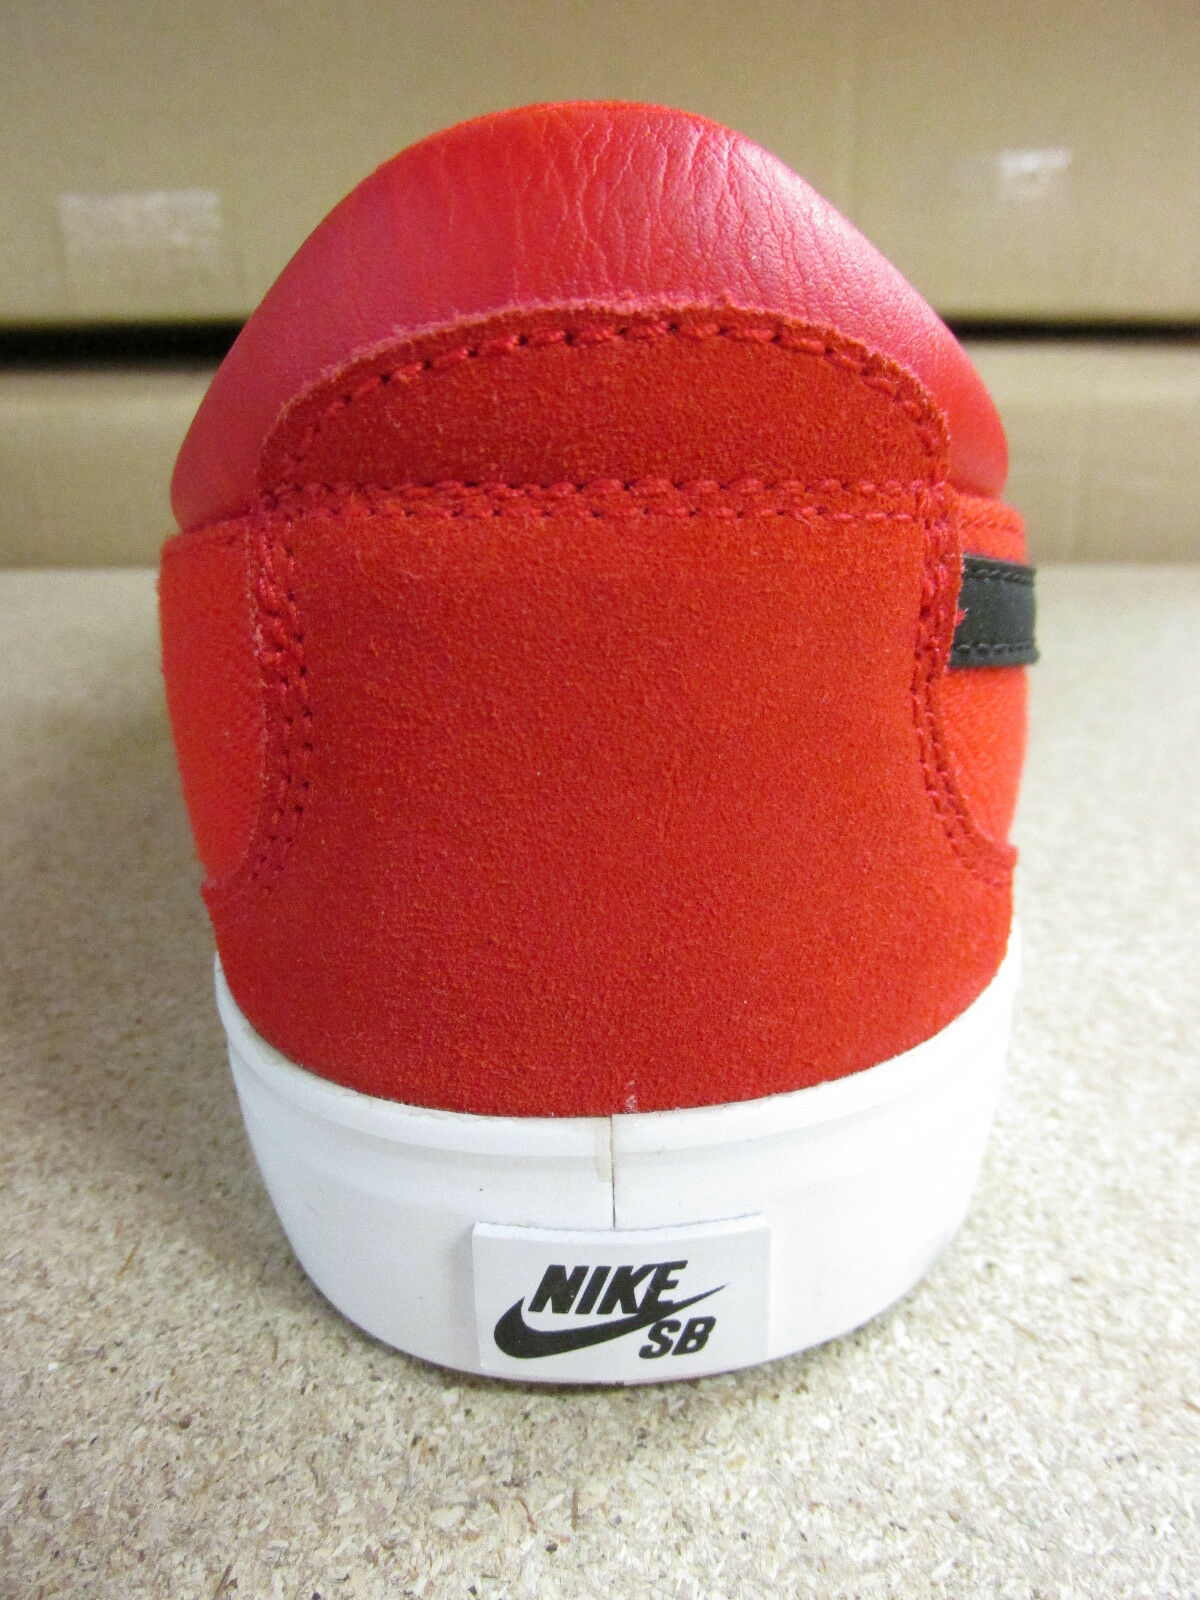 Nike Turnschuhe Sb Rabona LR Herren Turnschuhe Nike 641747 601 Turnschuhe e88f3b